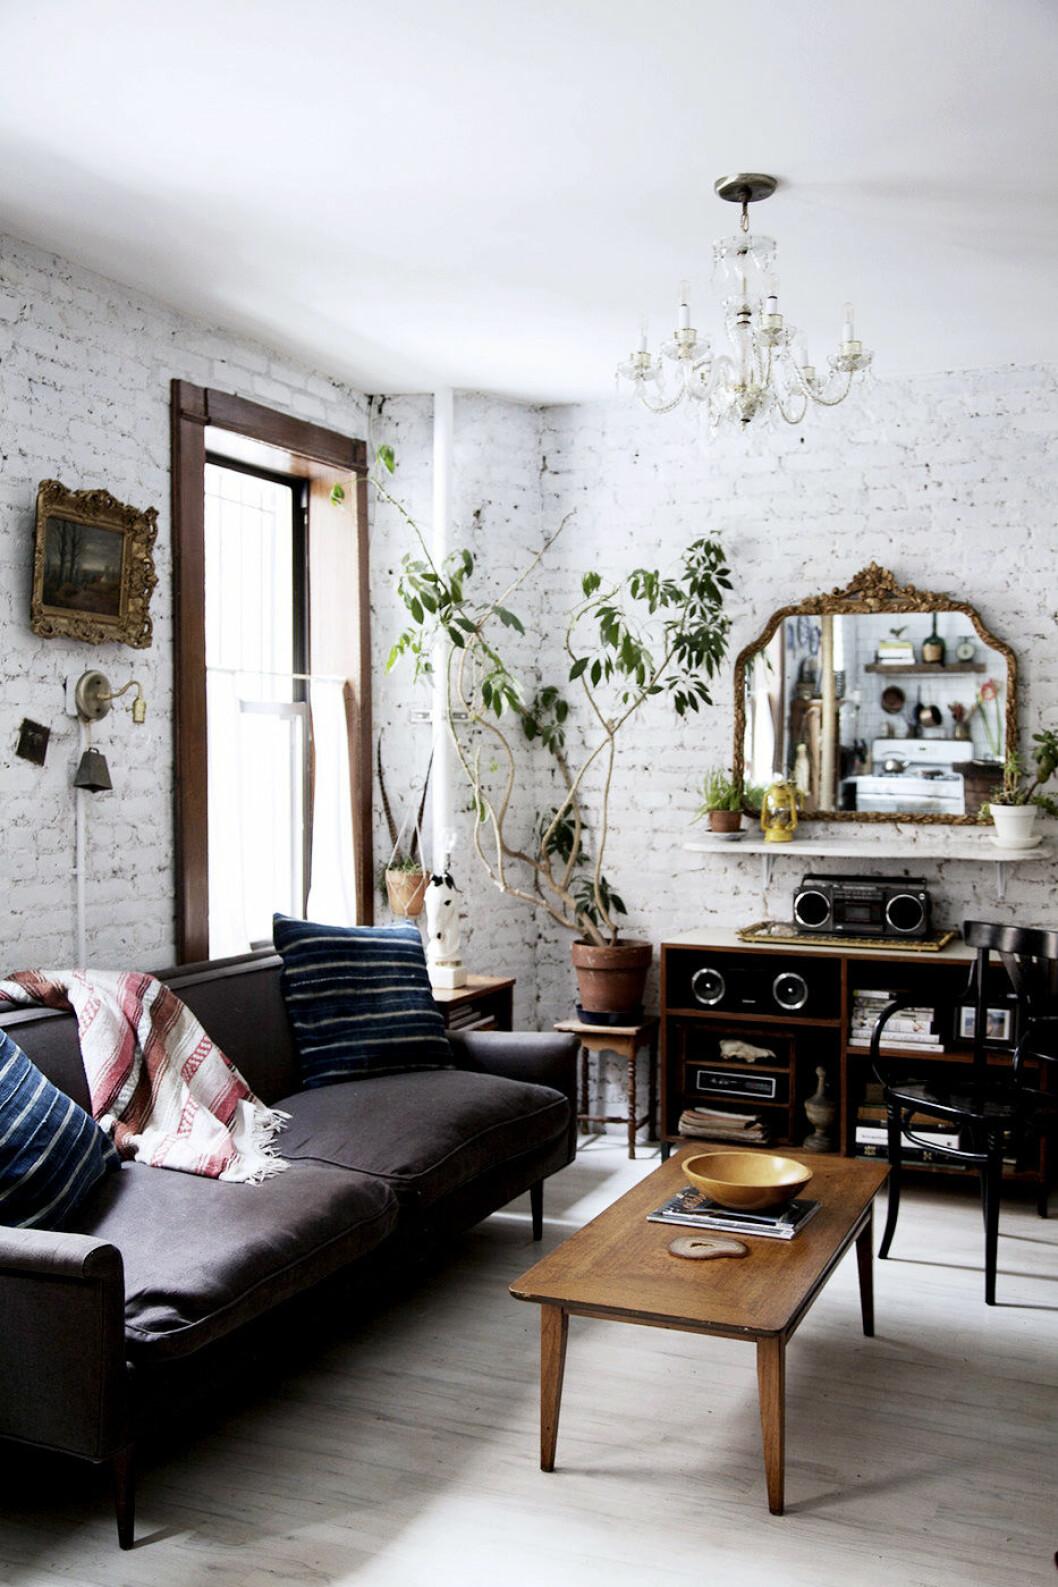 Vitmålad tegelvägg i ett vardagsrum